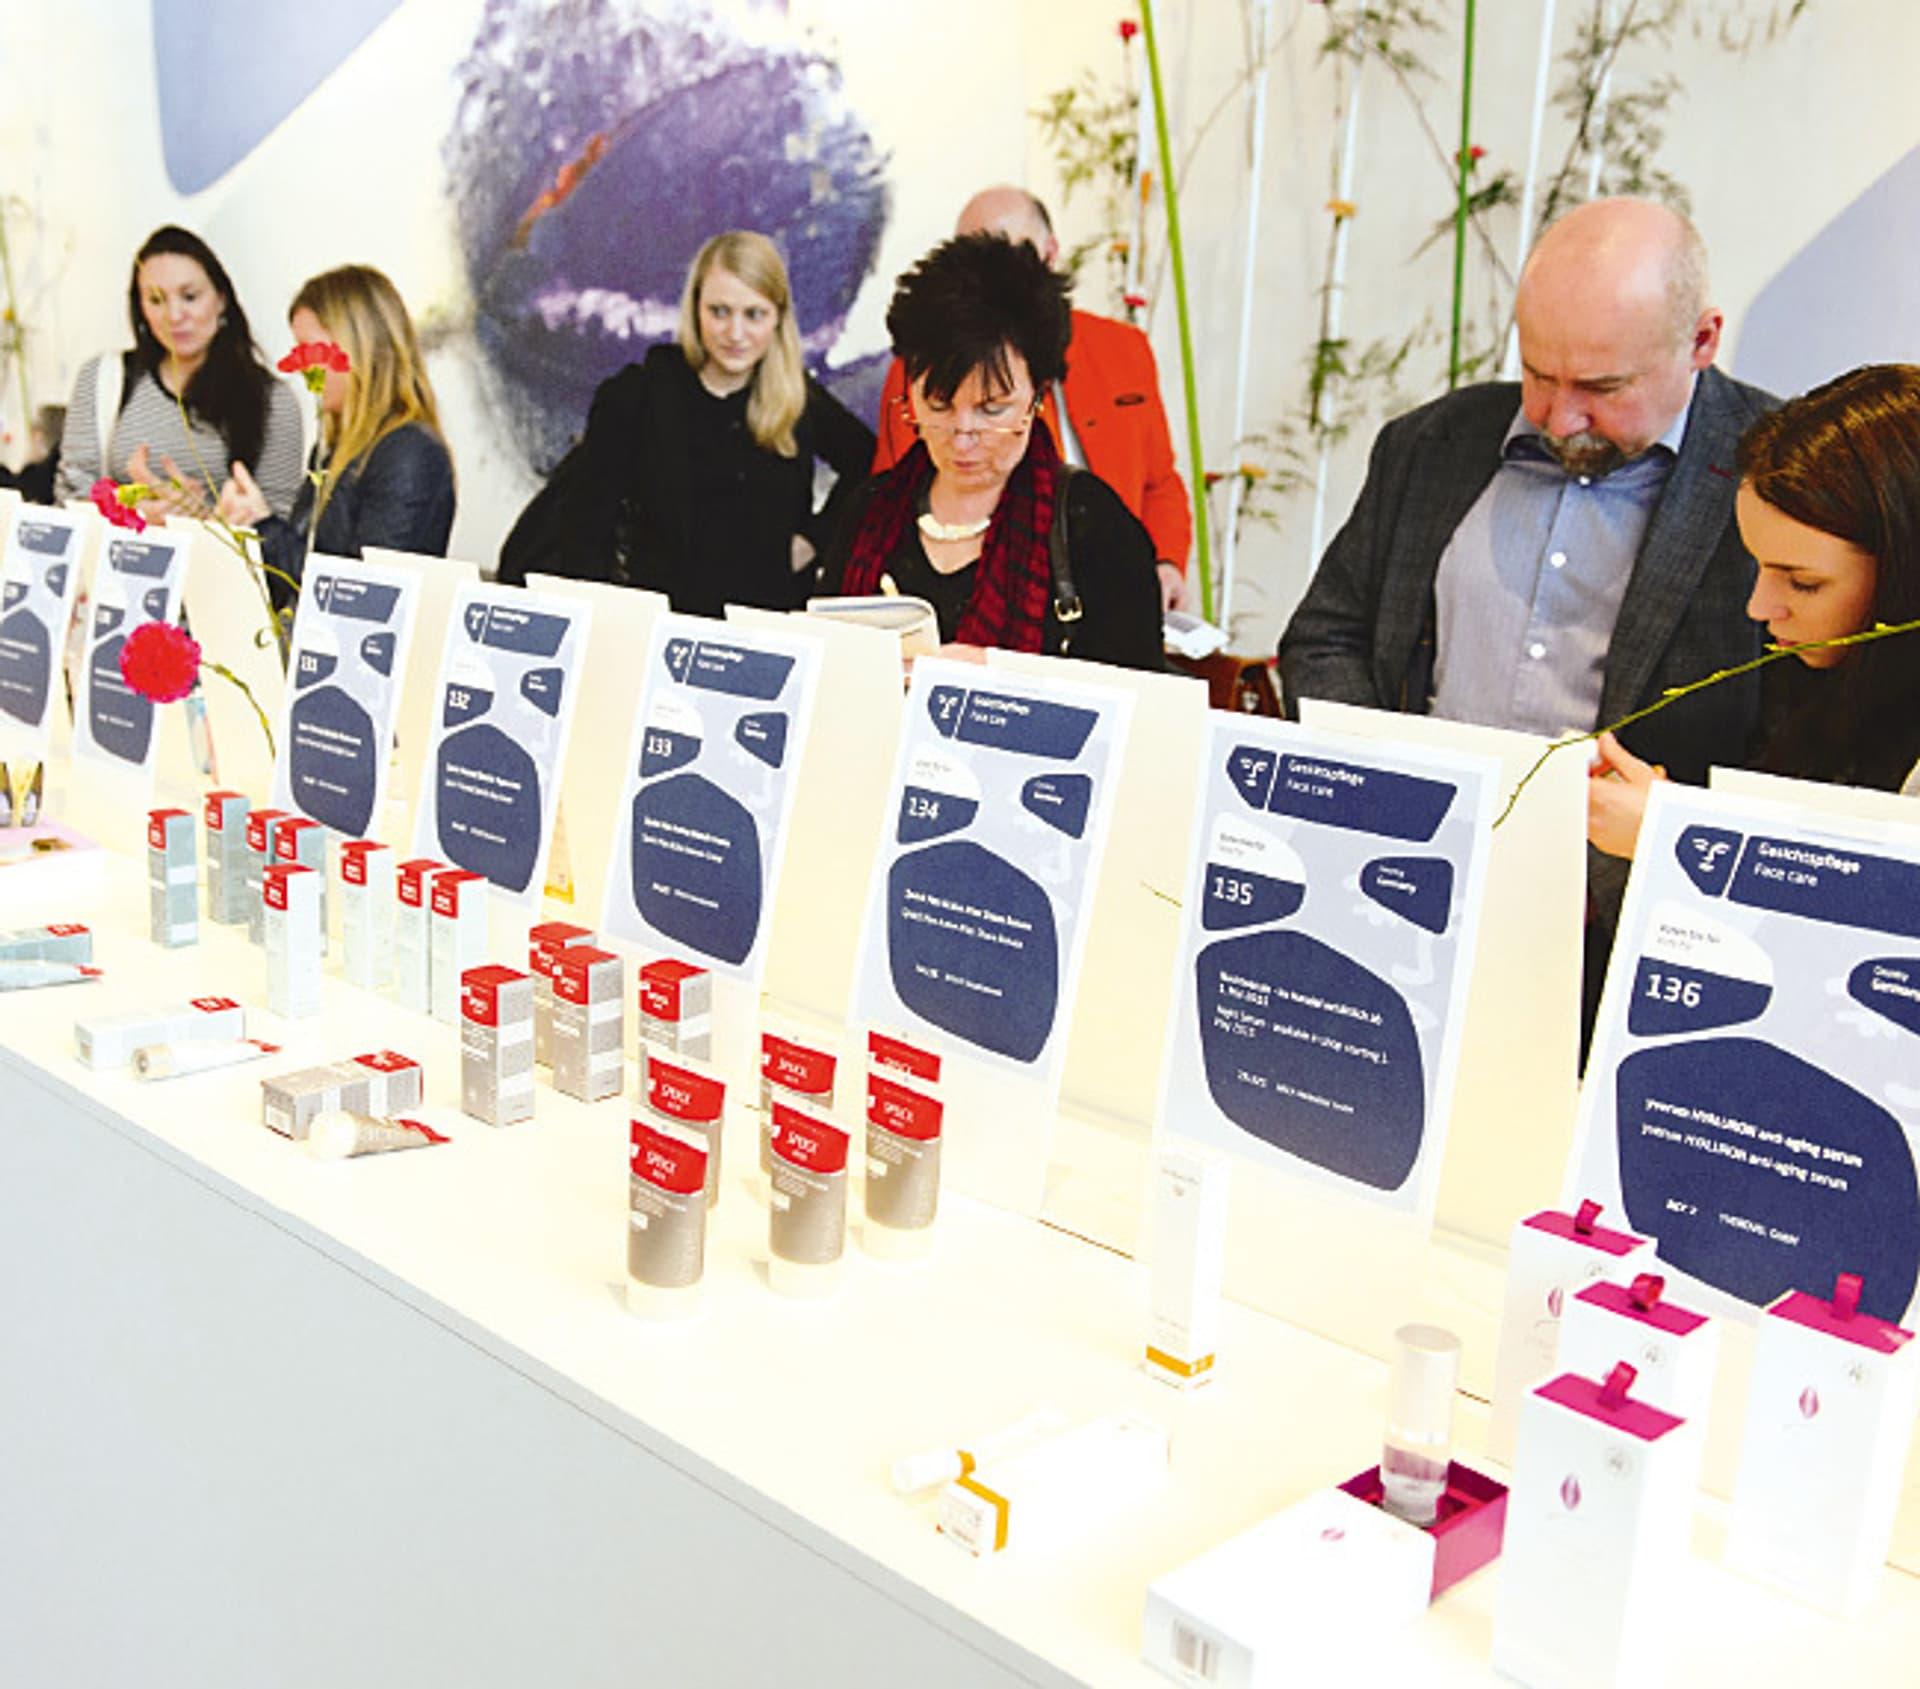 Kosmetikmesse Vivaness (Foto: Nürnberg Messe)